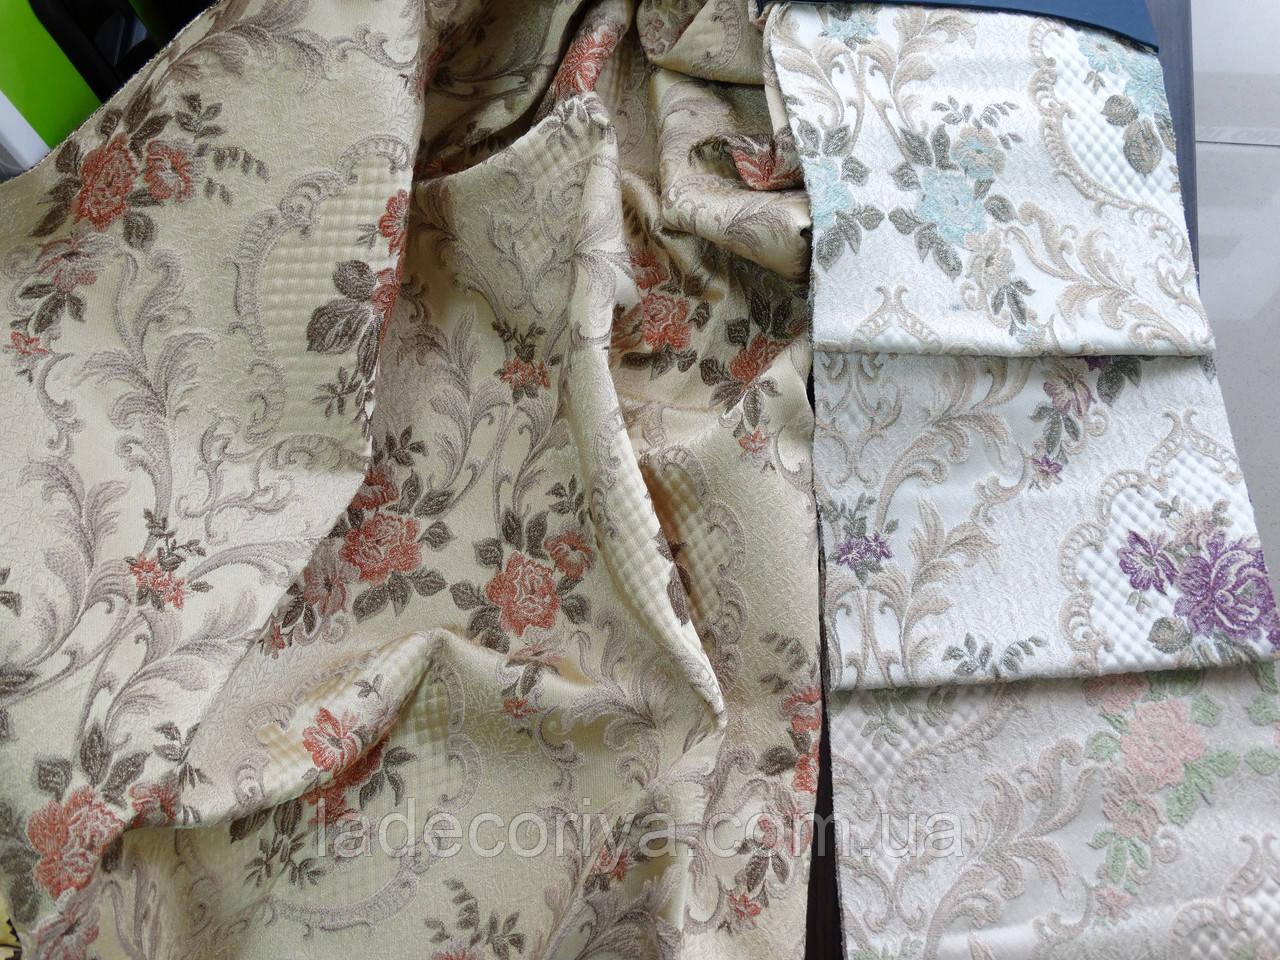 fa8a7e3f6564 Ткань для штор и обивки мебели гобелен - Салон штор La Decoriya в  Хмельницком